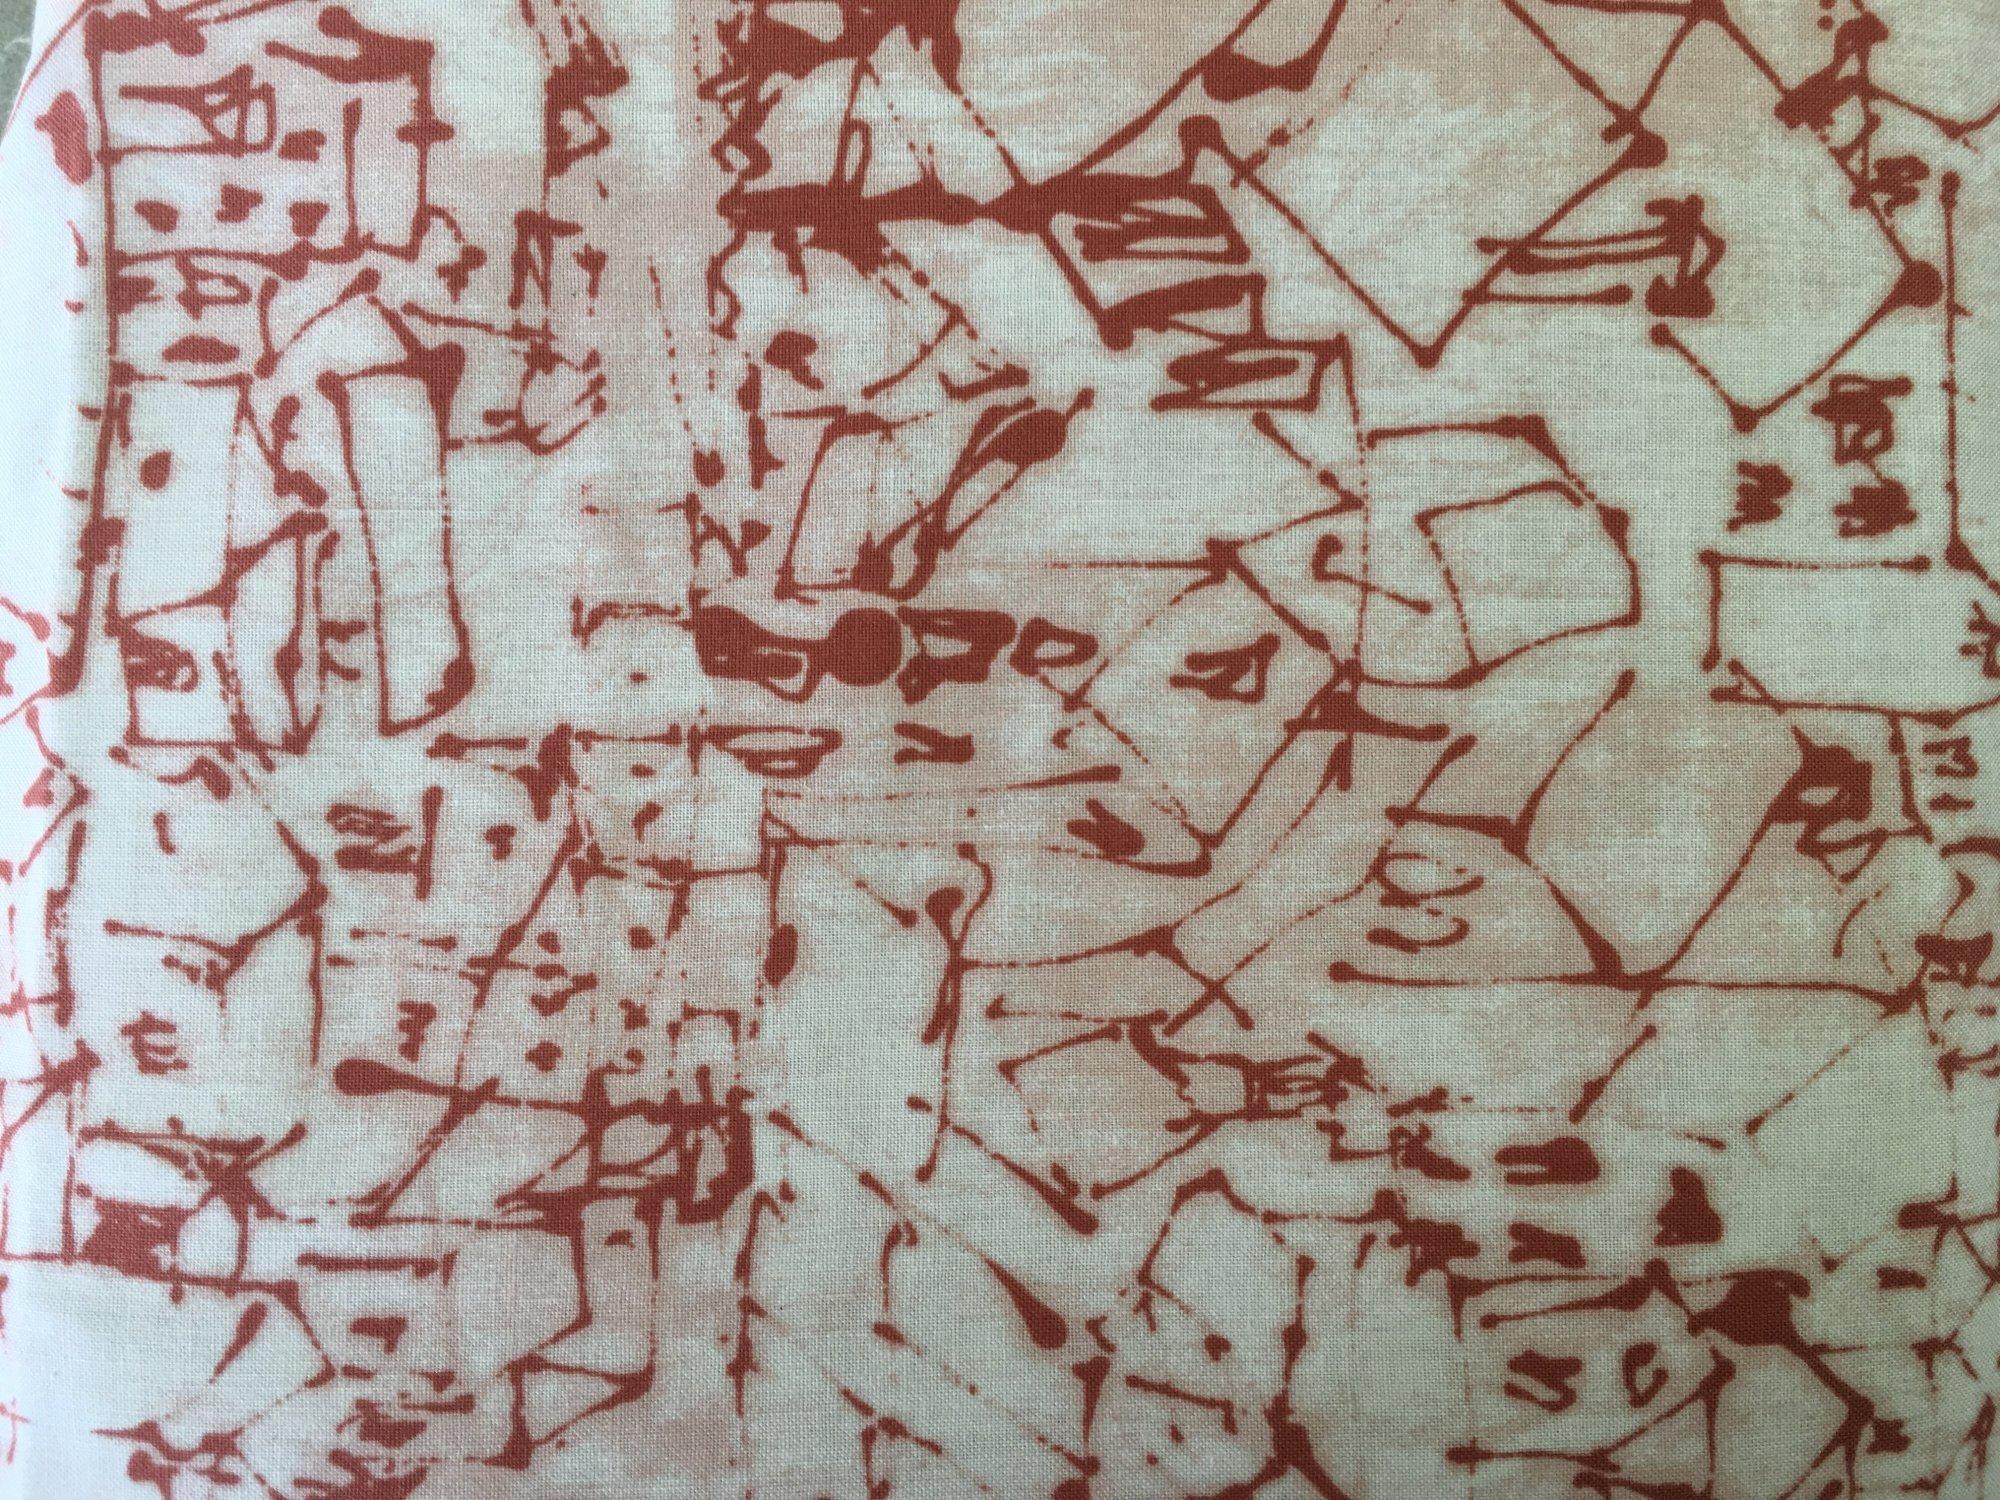 Art History 101 504136. Marcia Derse by Windham